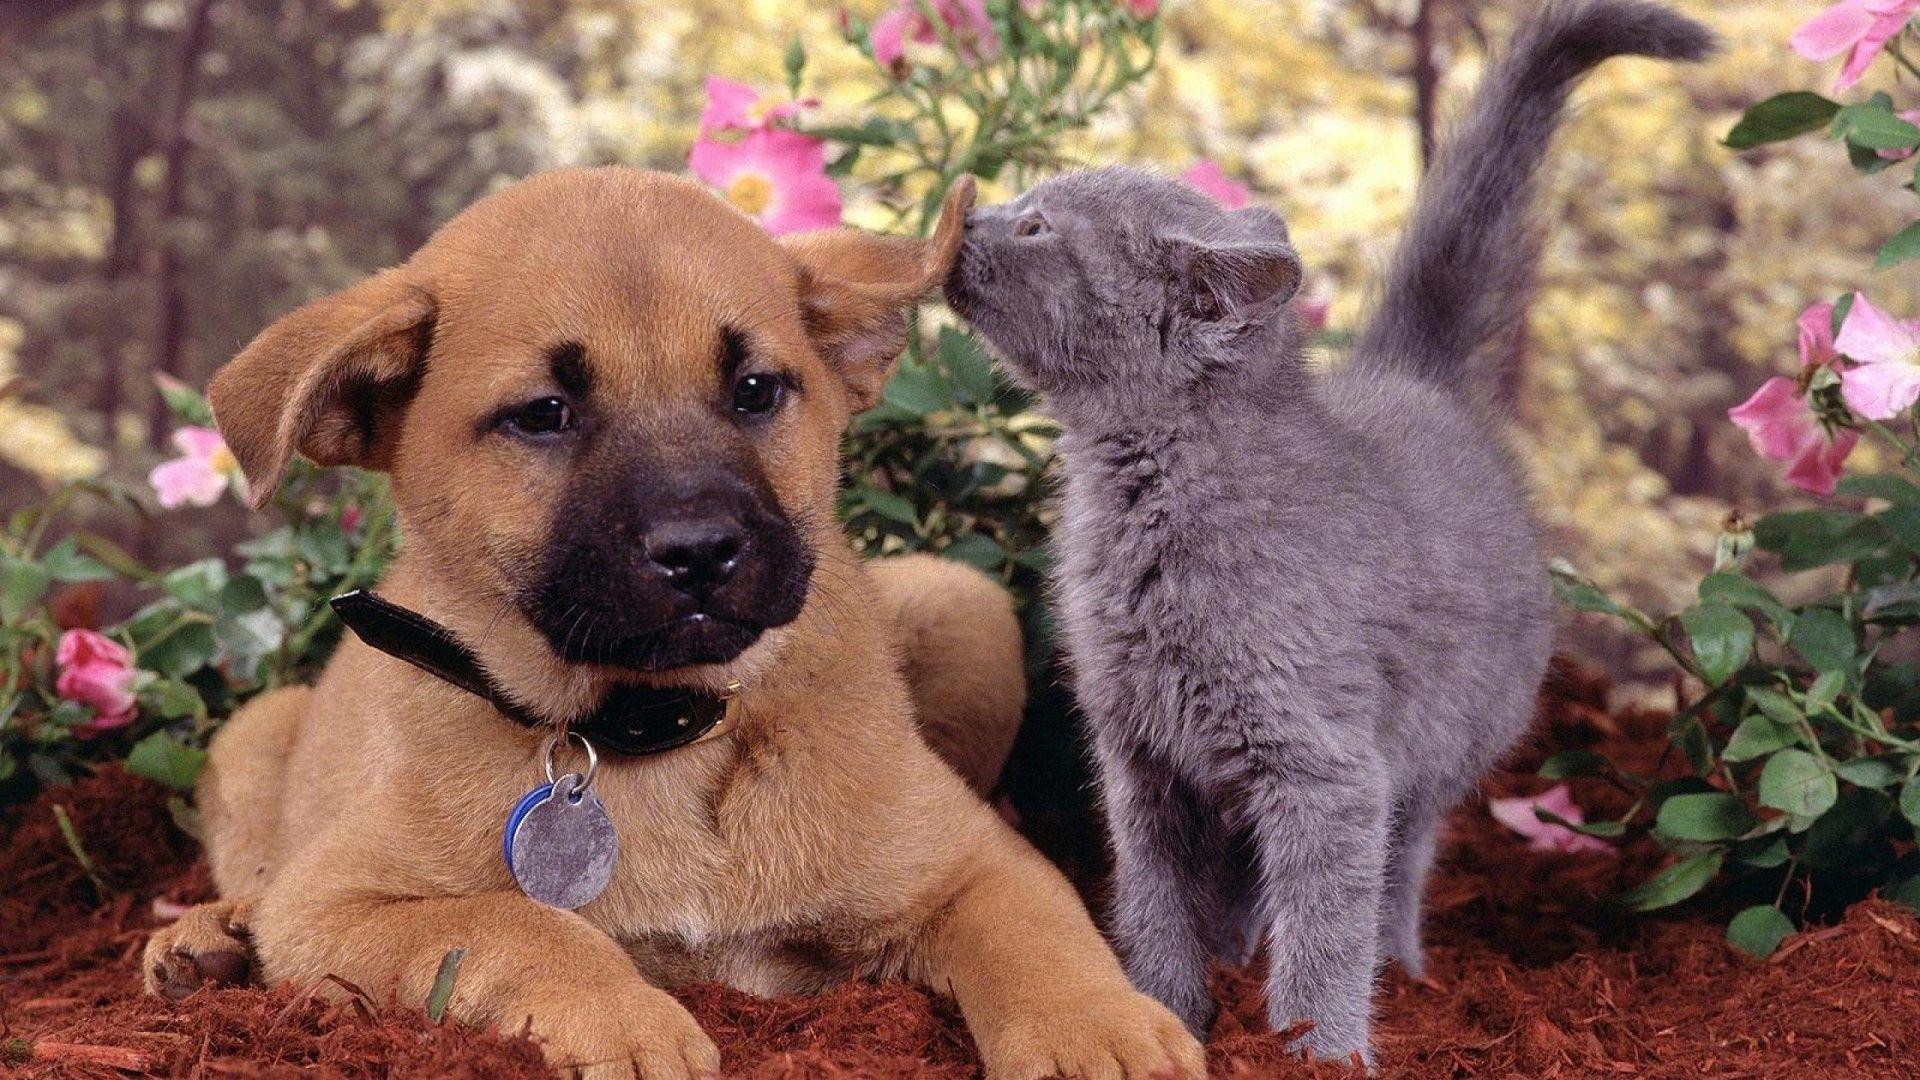 Puppy And Kitten Free Desktop Wallpaper